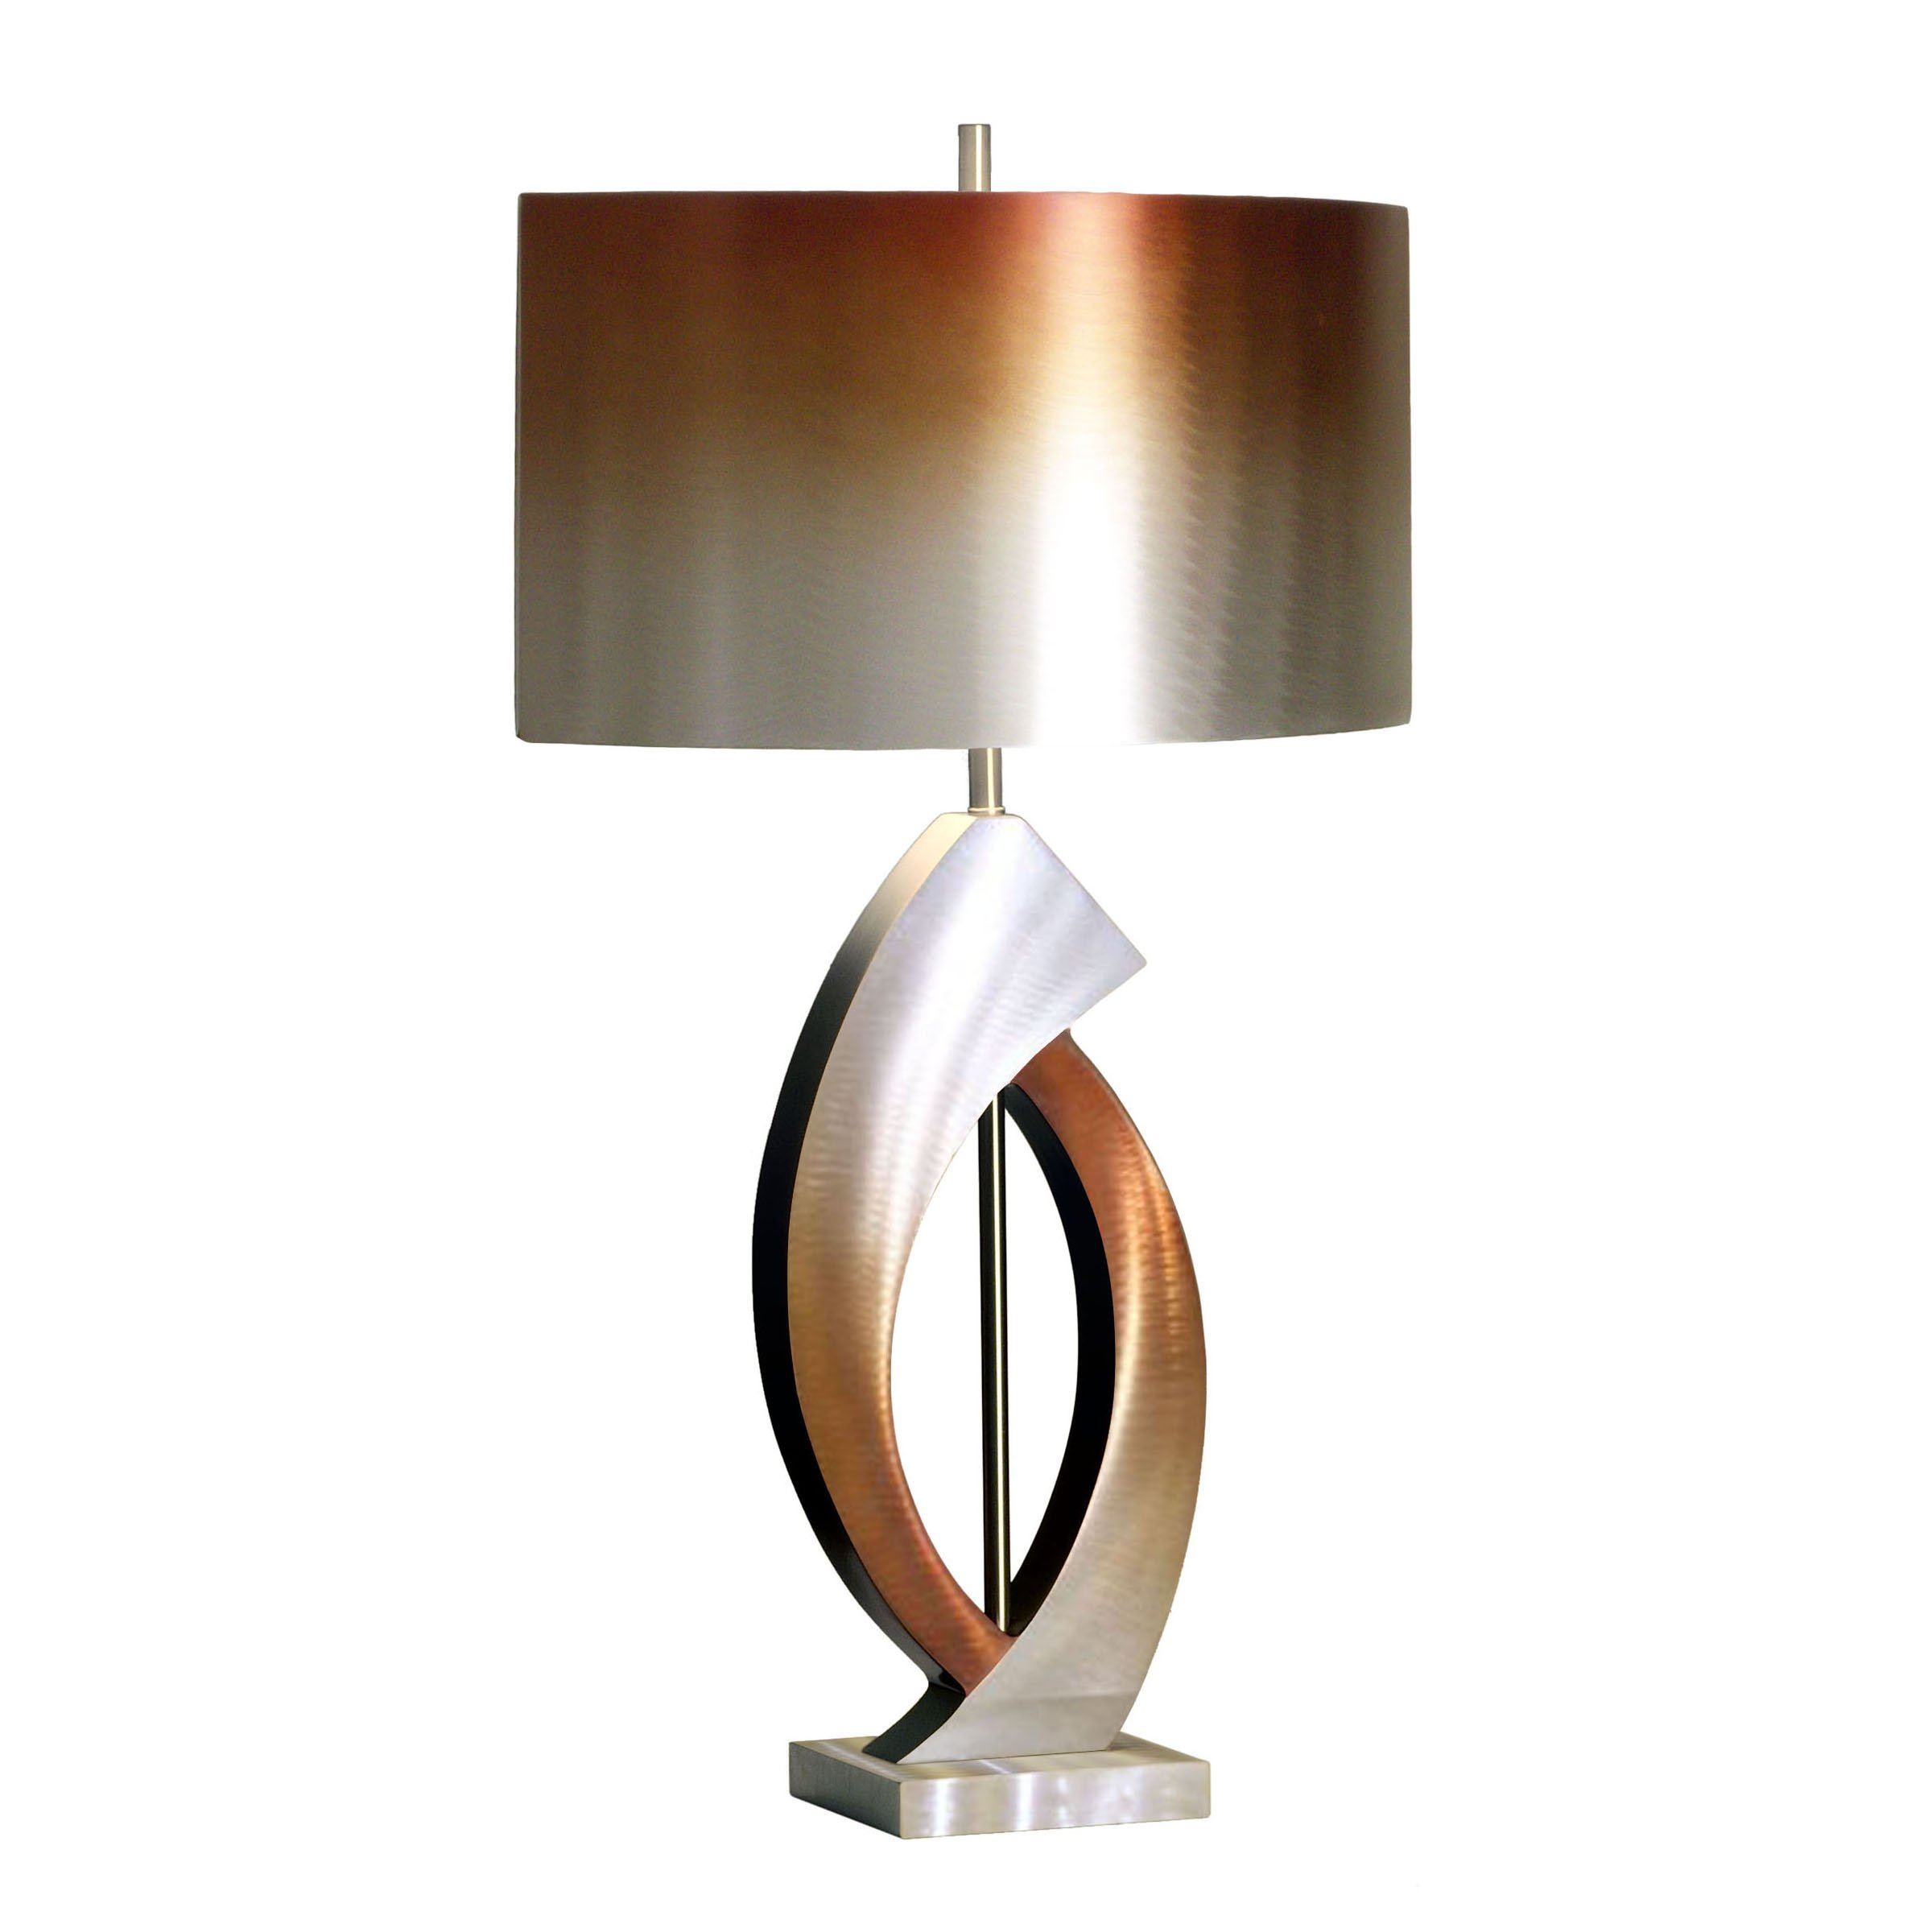 Nova Lighting 10640 Swerve Table Lamp, Brushed Aluminum, Rust & Bronze with Rust & Bronze Aluminum Shade by Nova Lighting